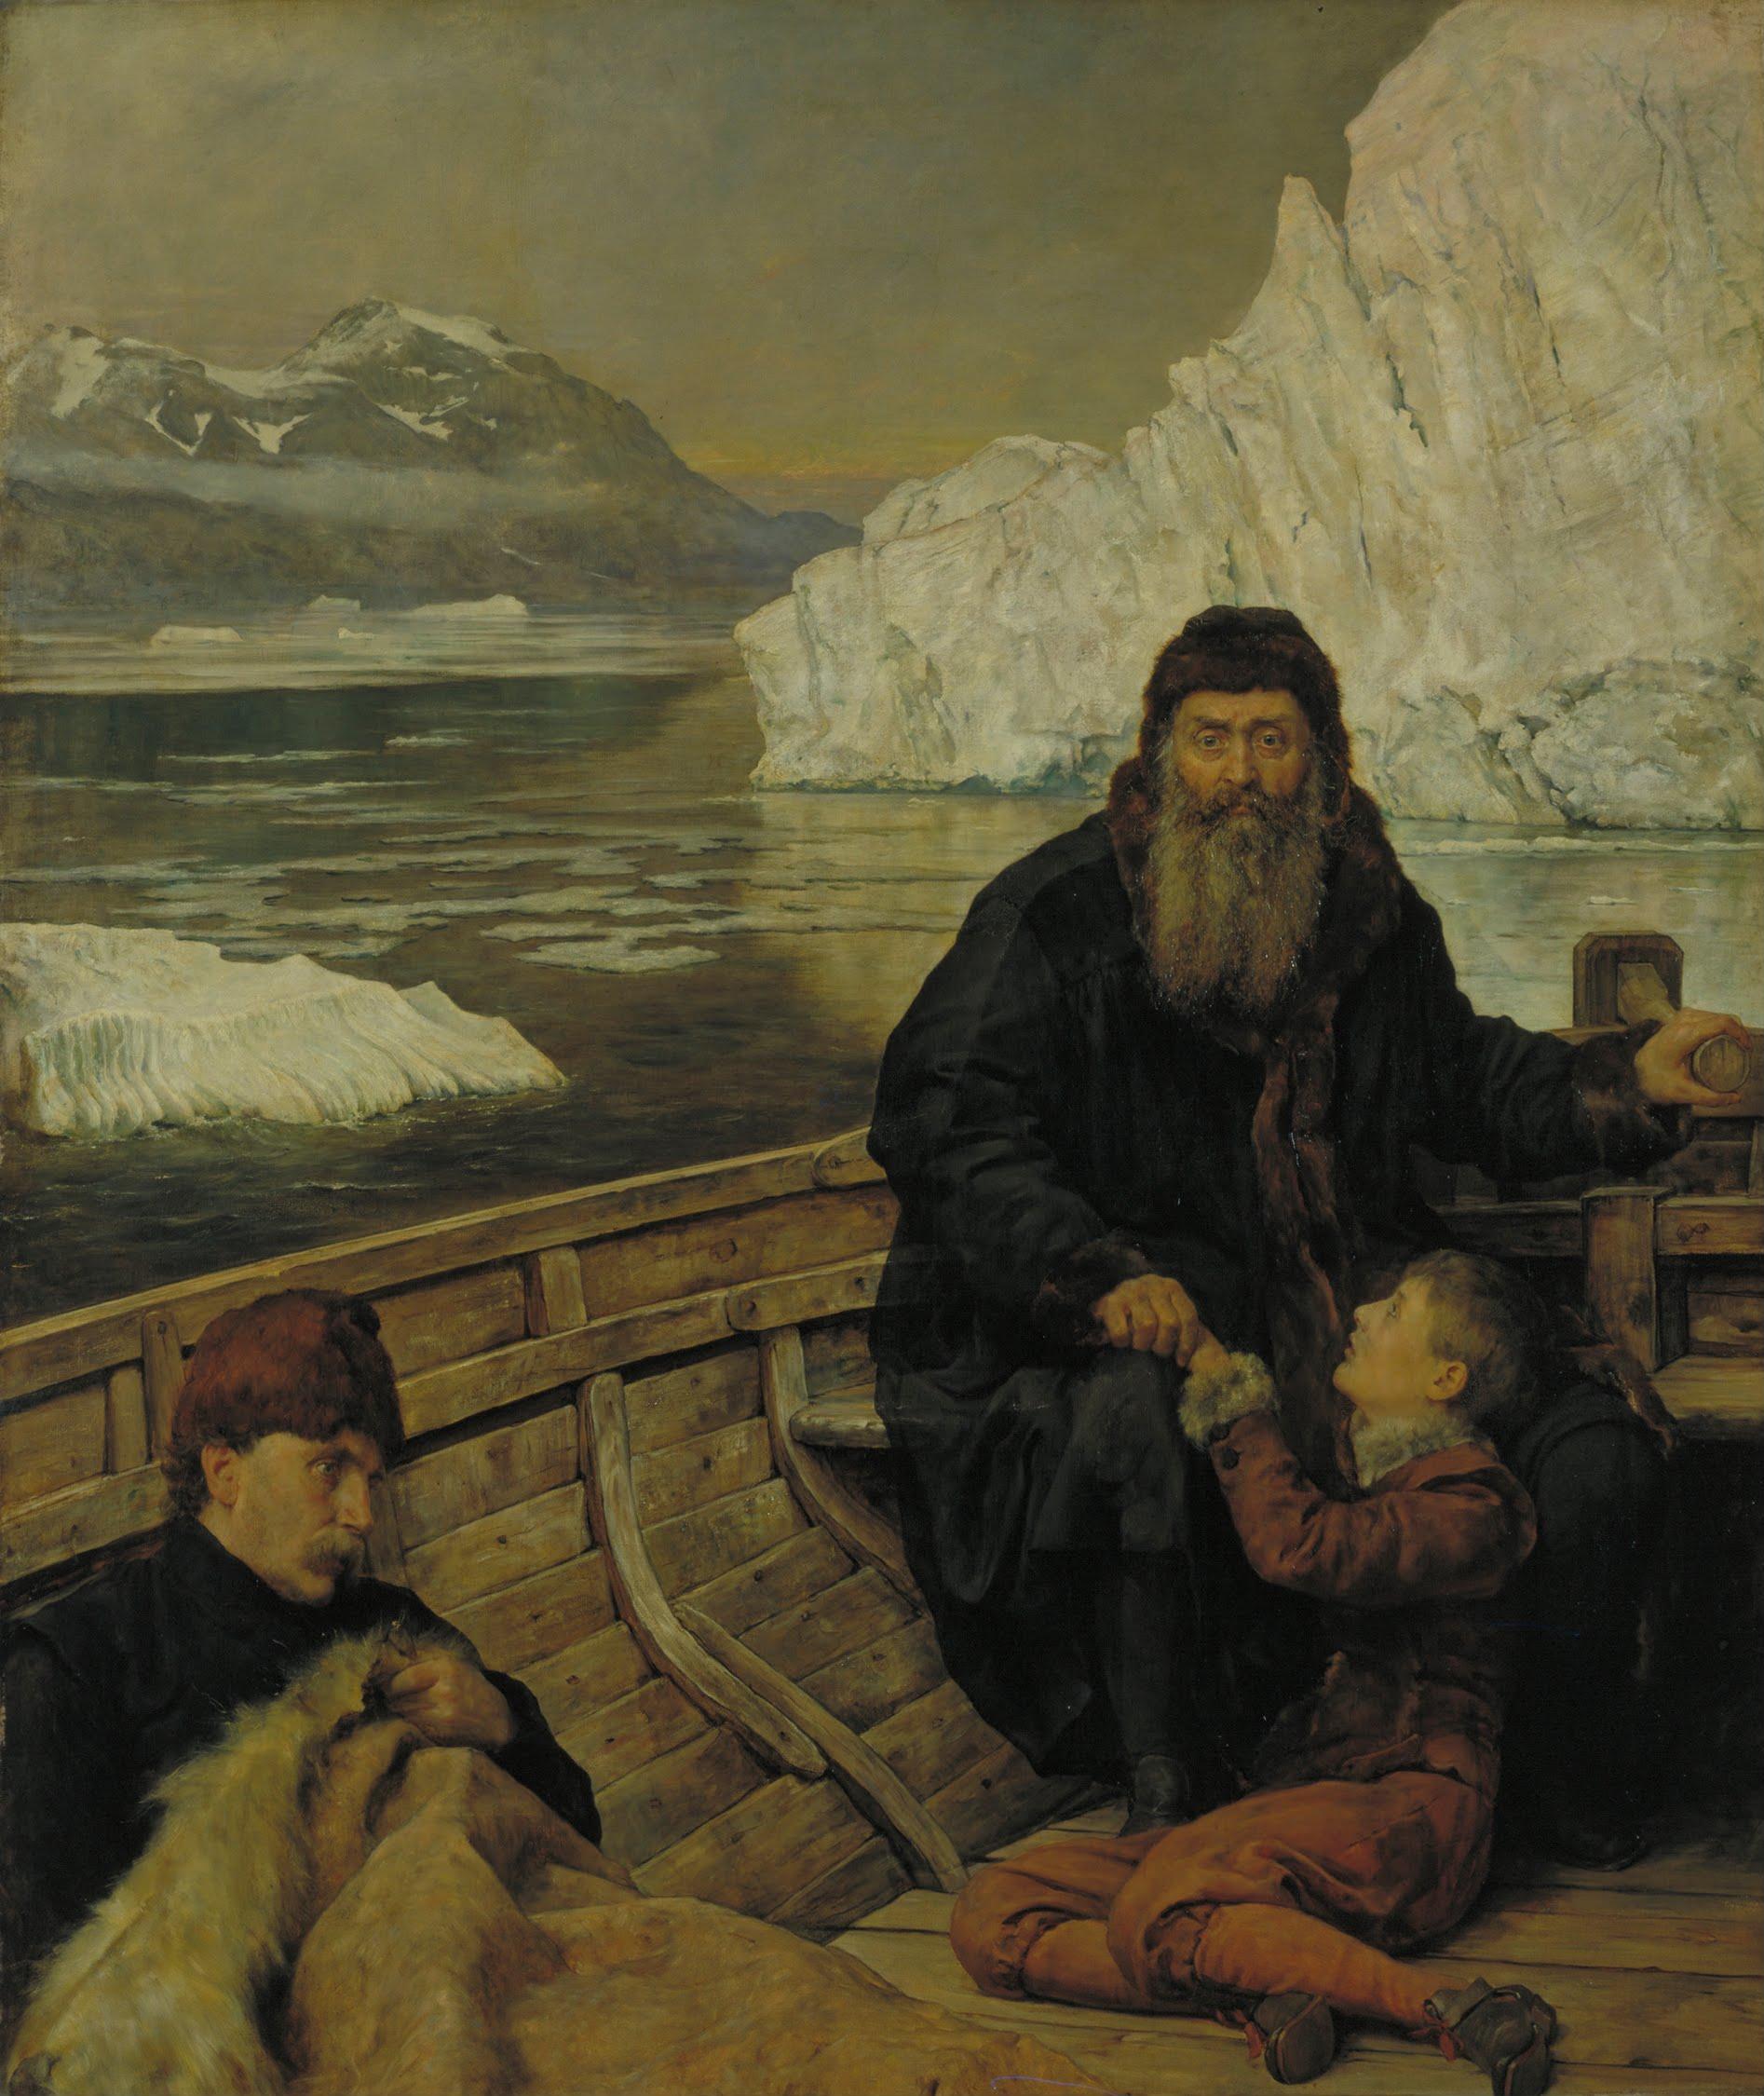 http://upload.wikimedia.org/wikipedia/commons/7/7c/John_Collier_-_The_Last_Voyage_of_Henry_Hudson_-_Google_Art_Project.jpg